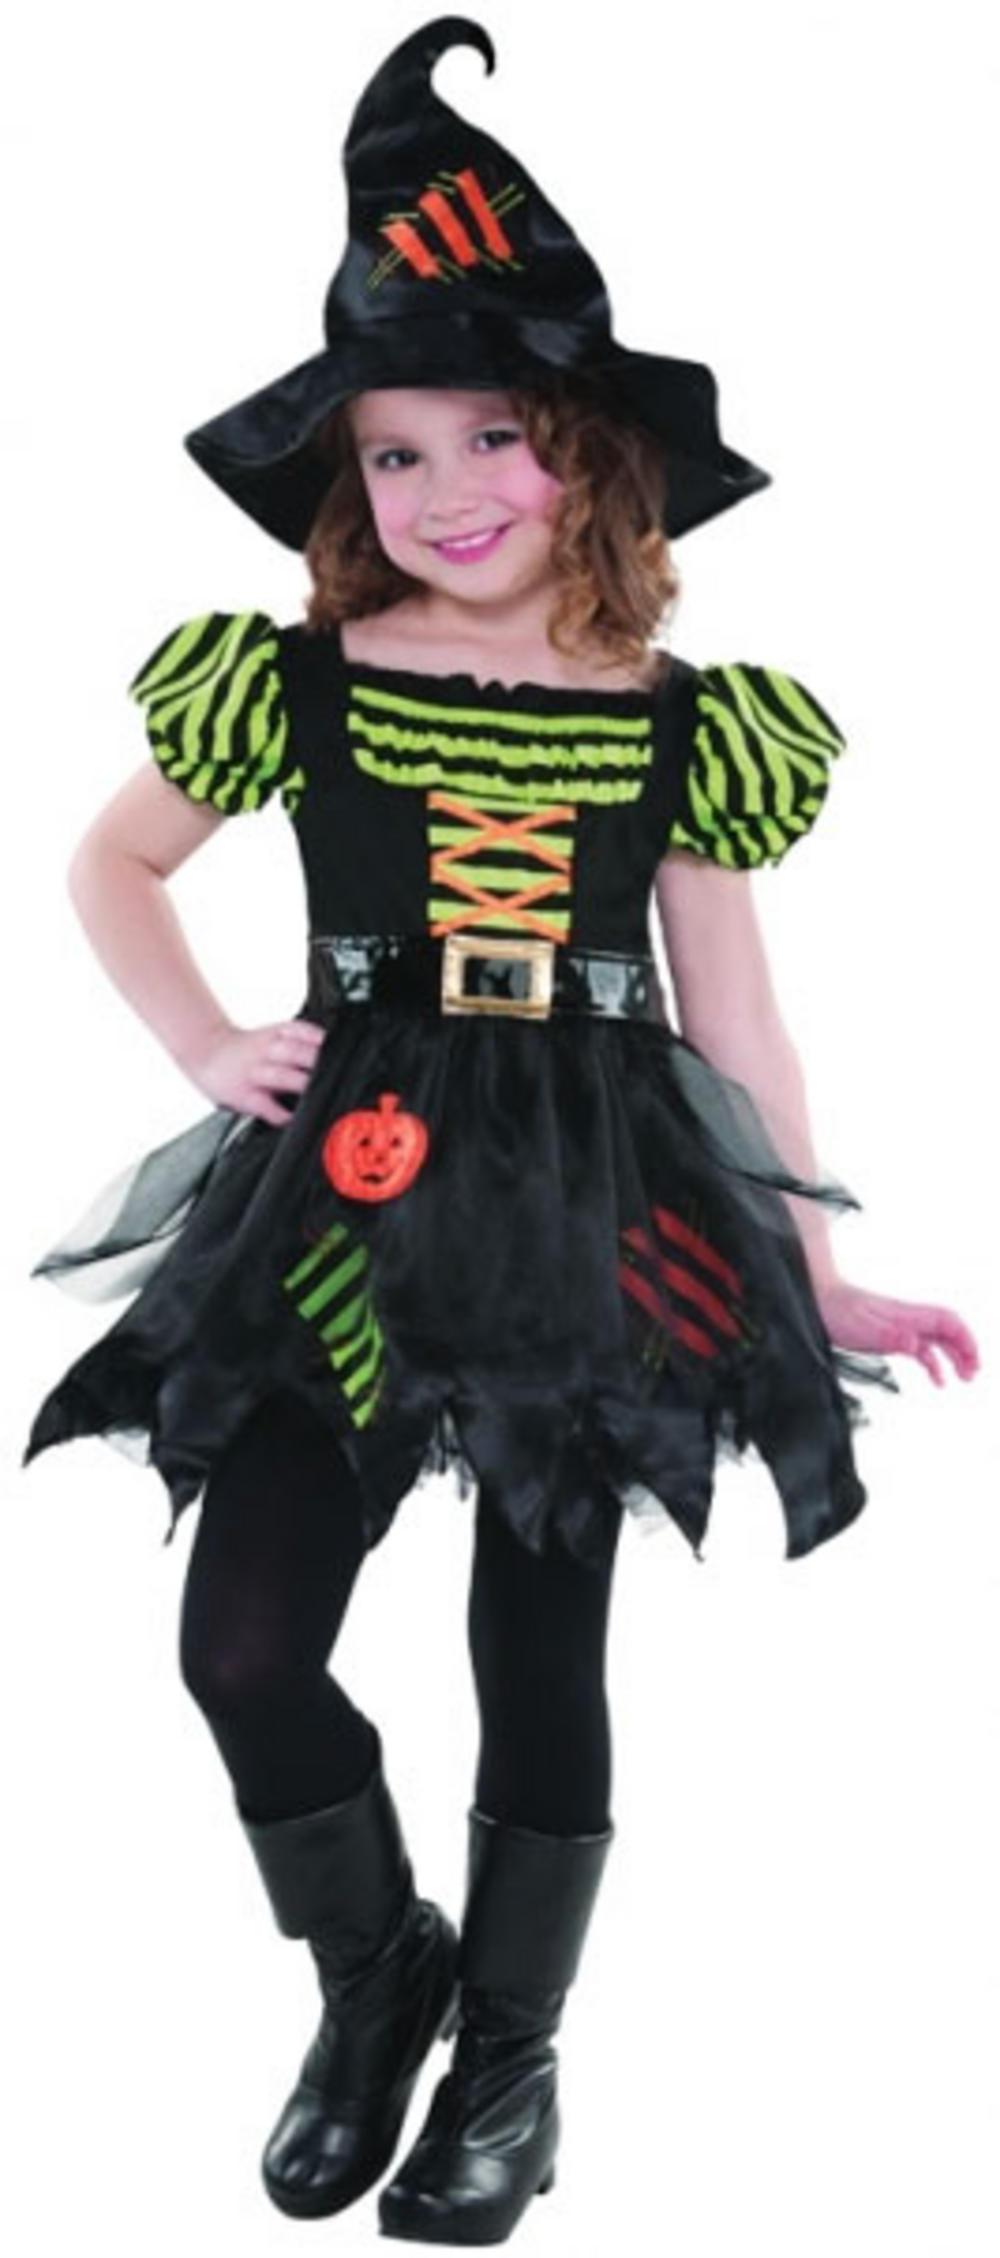 Pumpkin Patch Witch Costume  sc 1 st  Mega Fancy Dress & Pumpkin Patch Witch Costume   All Halloween   Mega Fancy Dress